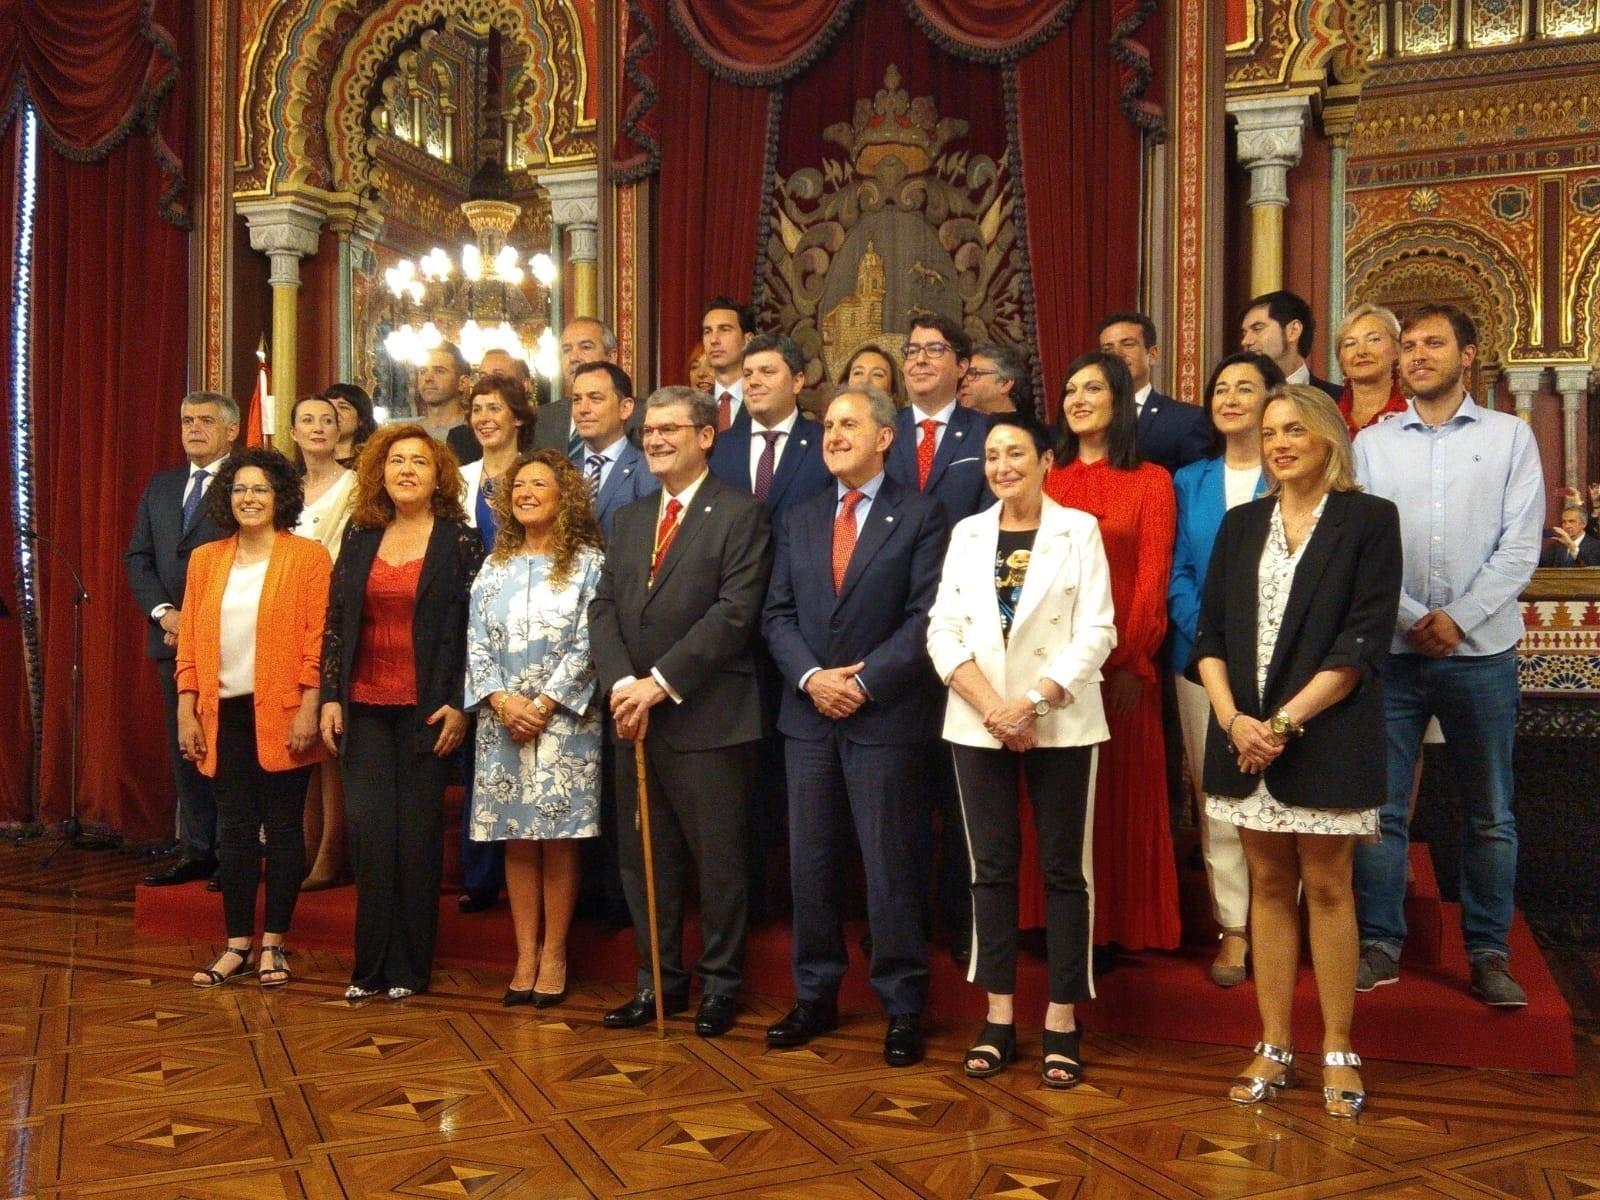 Aburto repite mandato en Bilbao con un pacto de gobierno con PSE